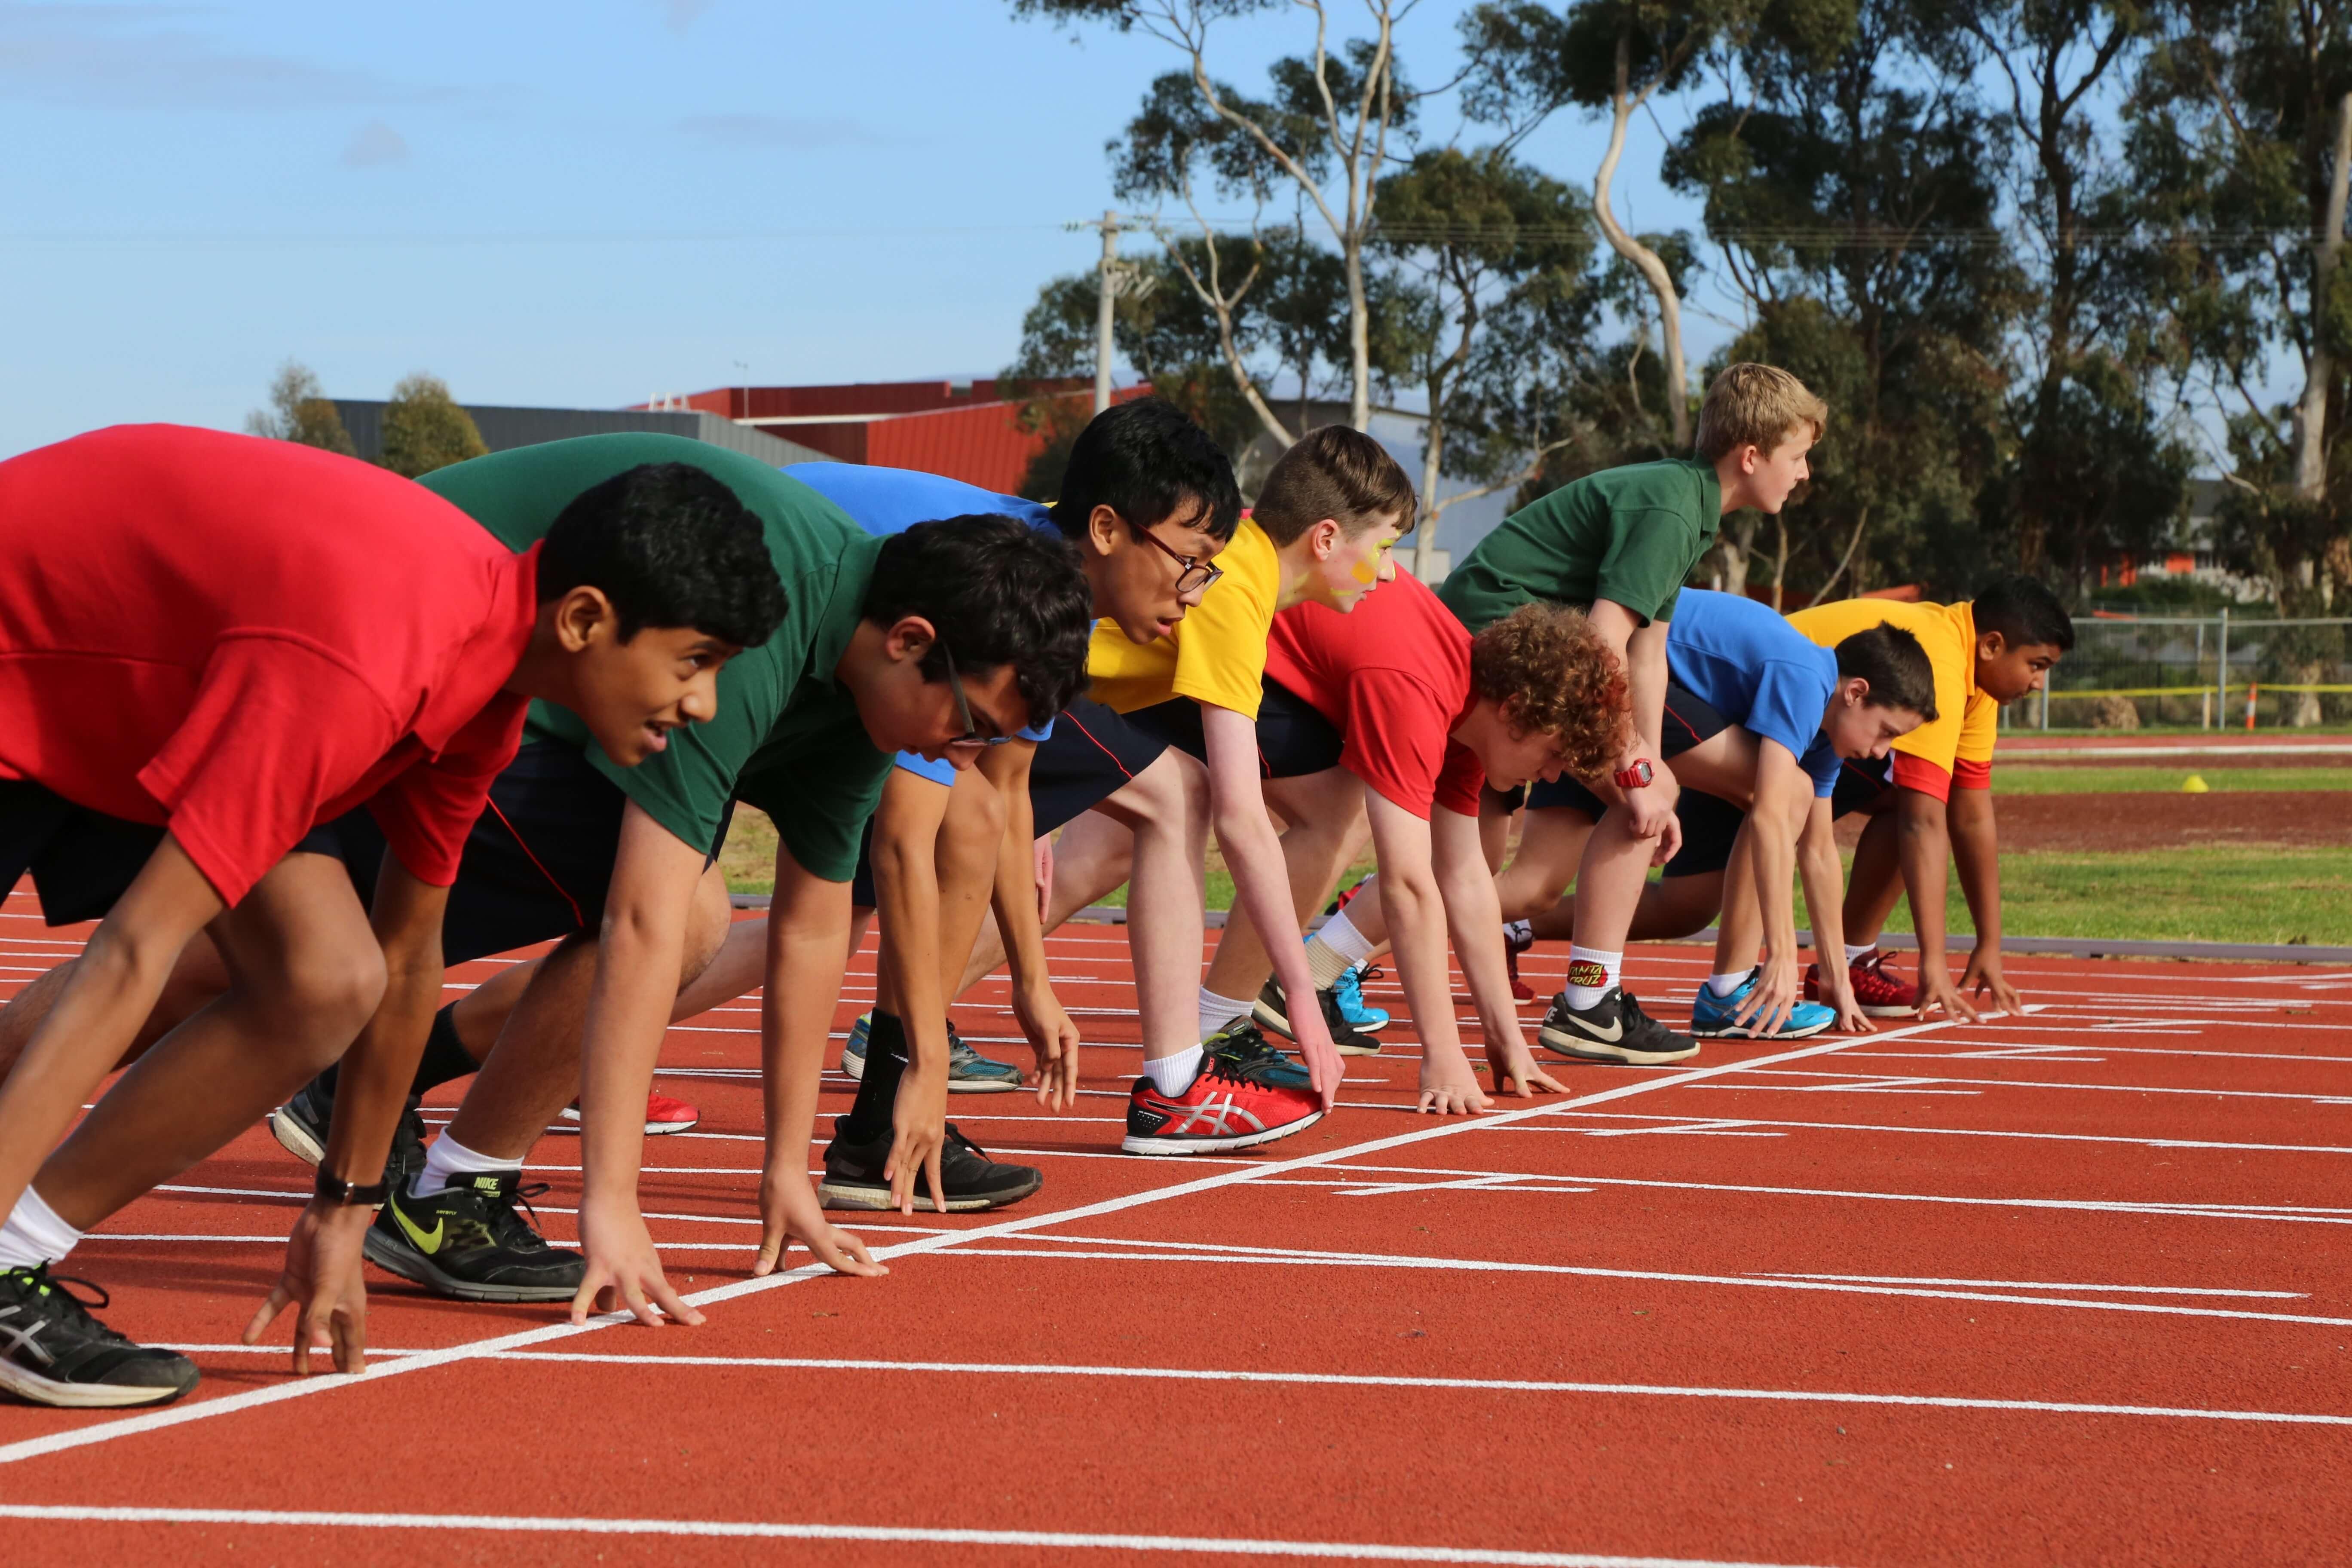 Heathdale SS students sport